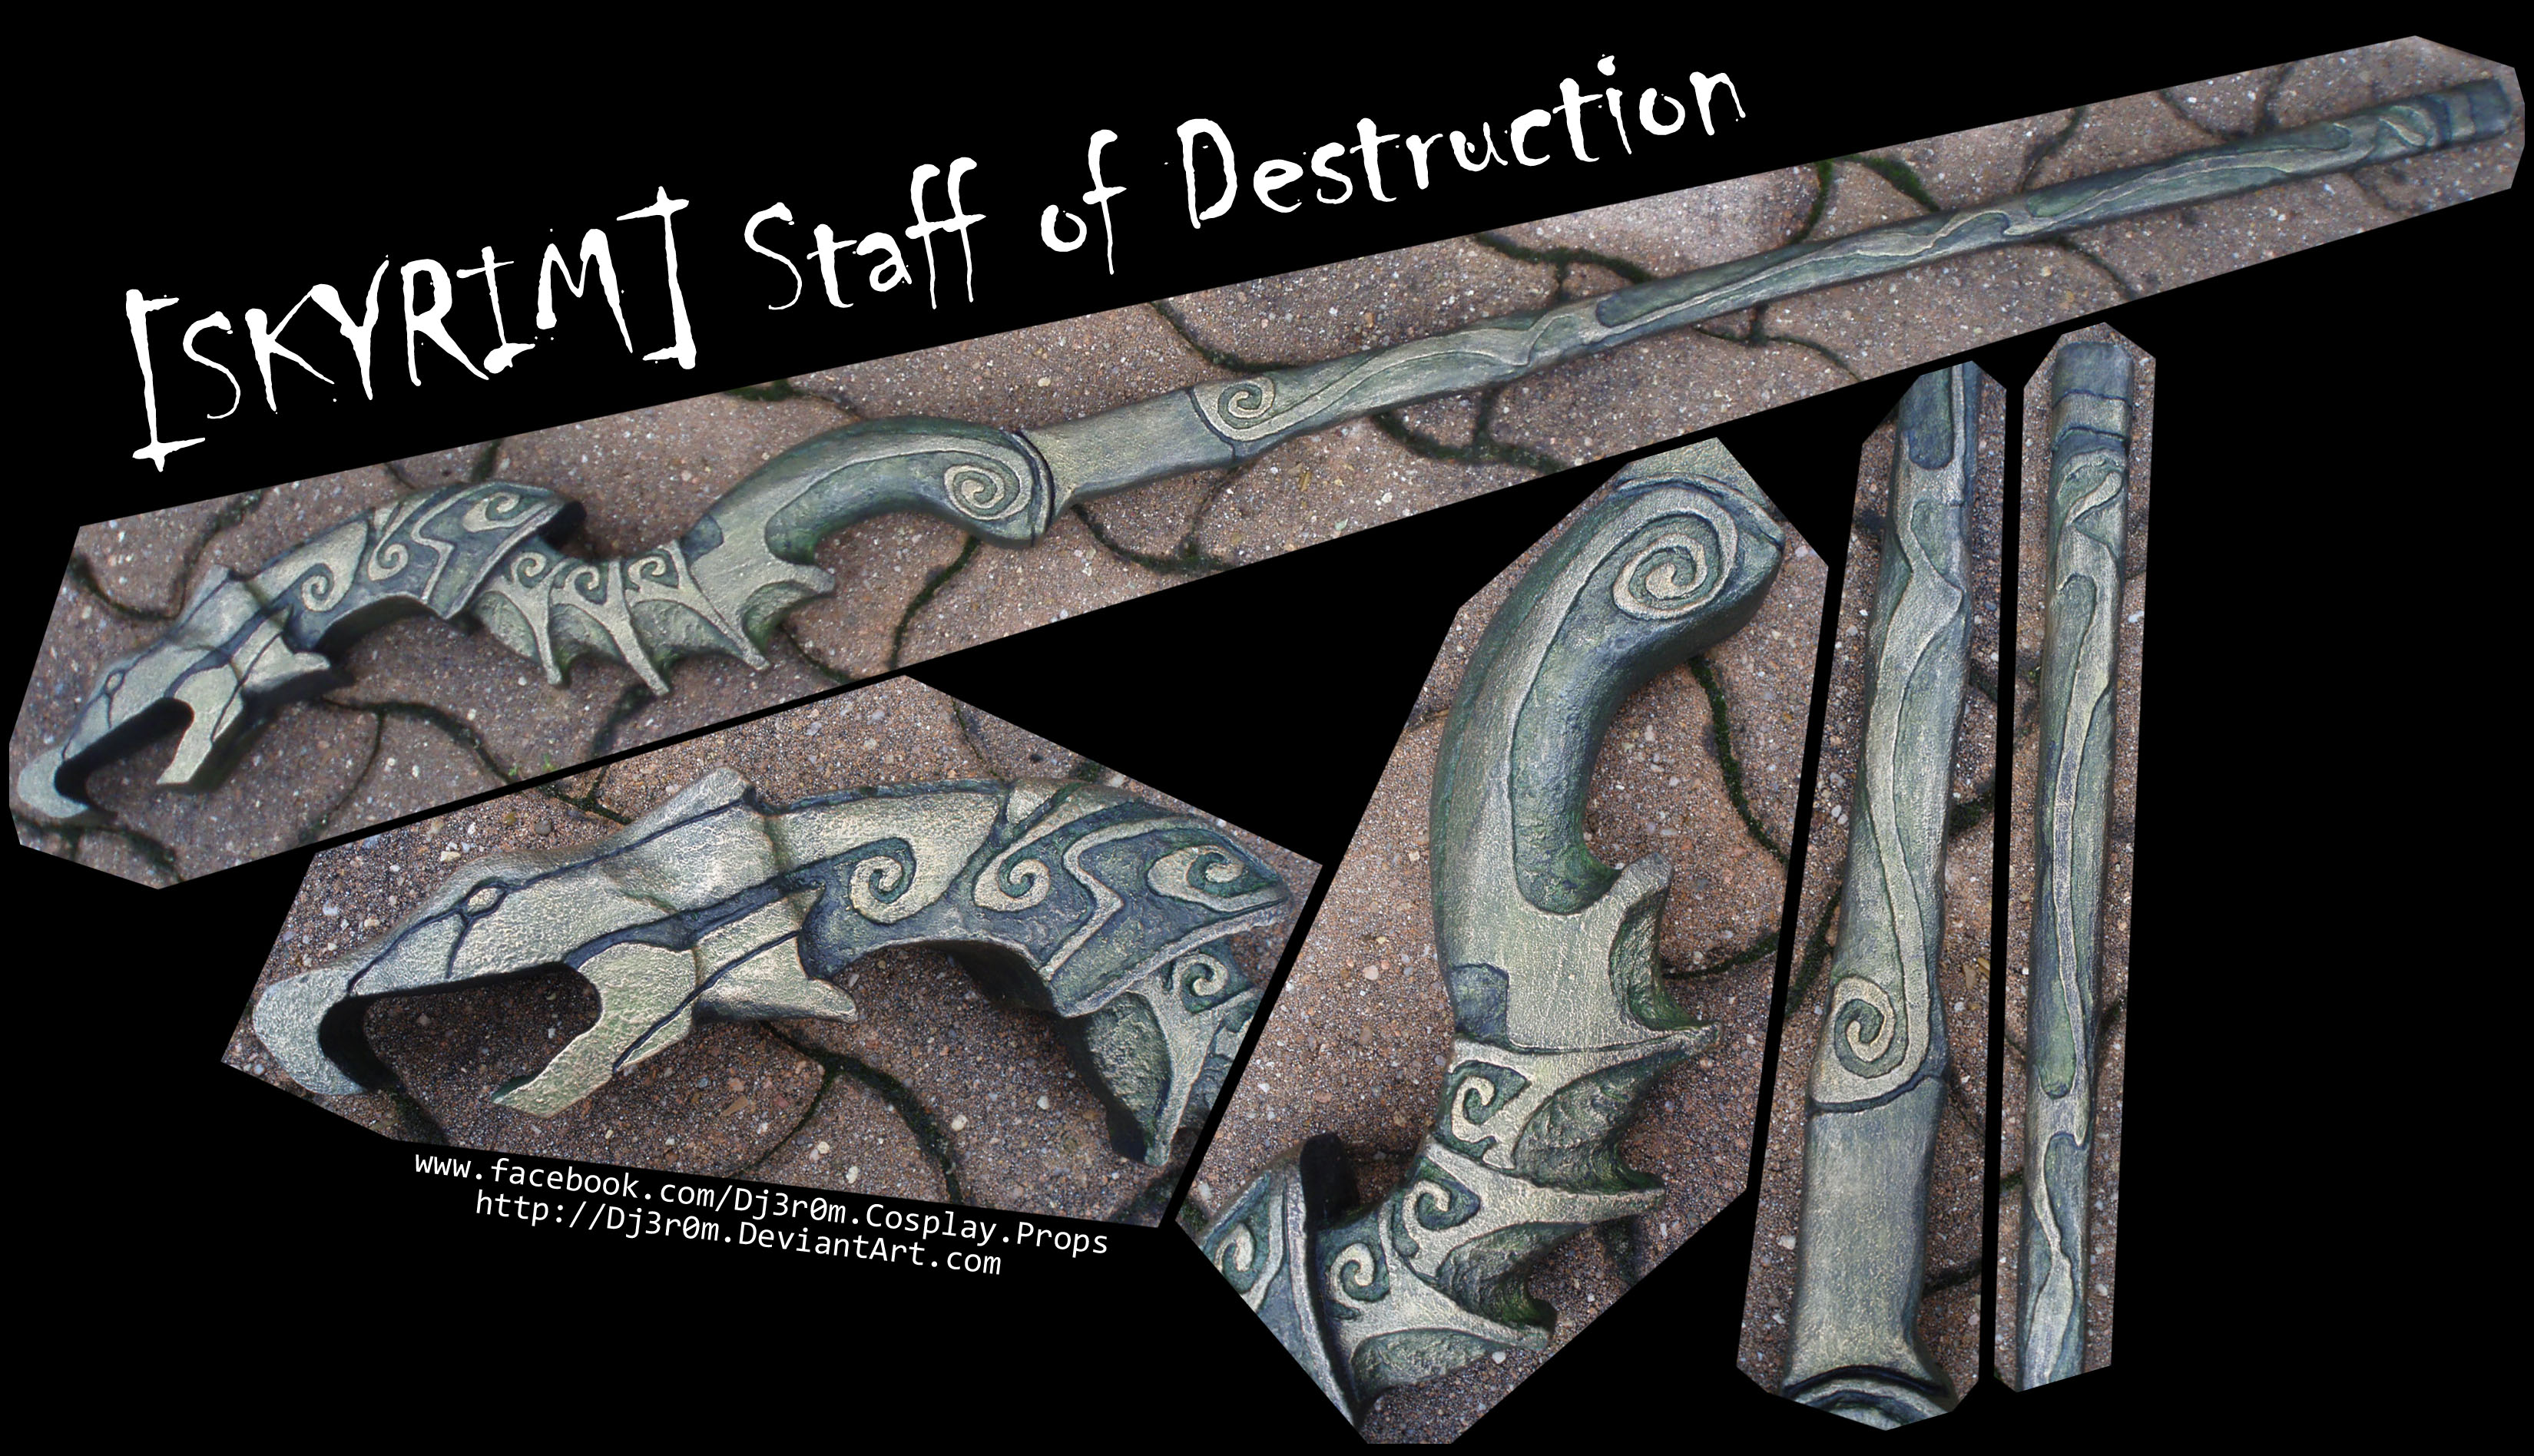 [SKYRIM] Staff Of Destruction by Dj3r0m